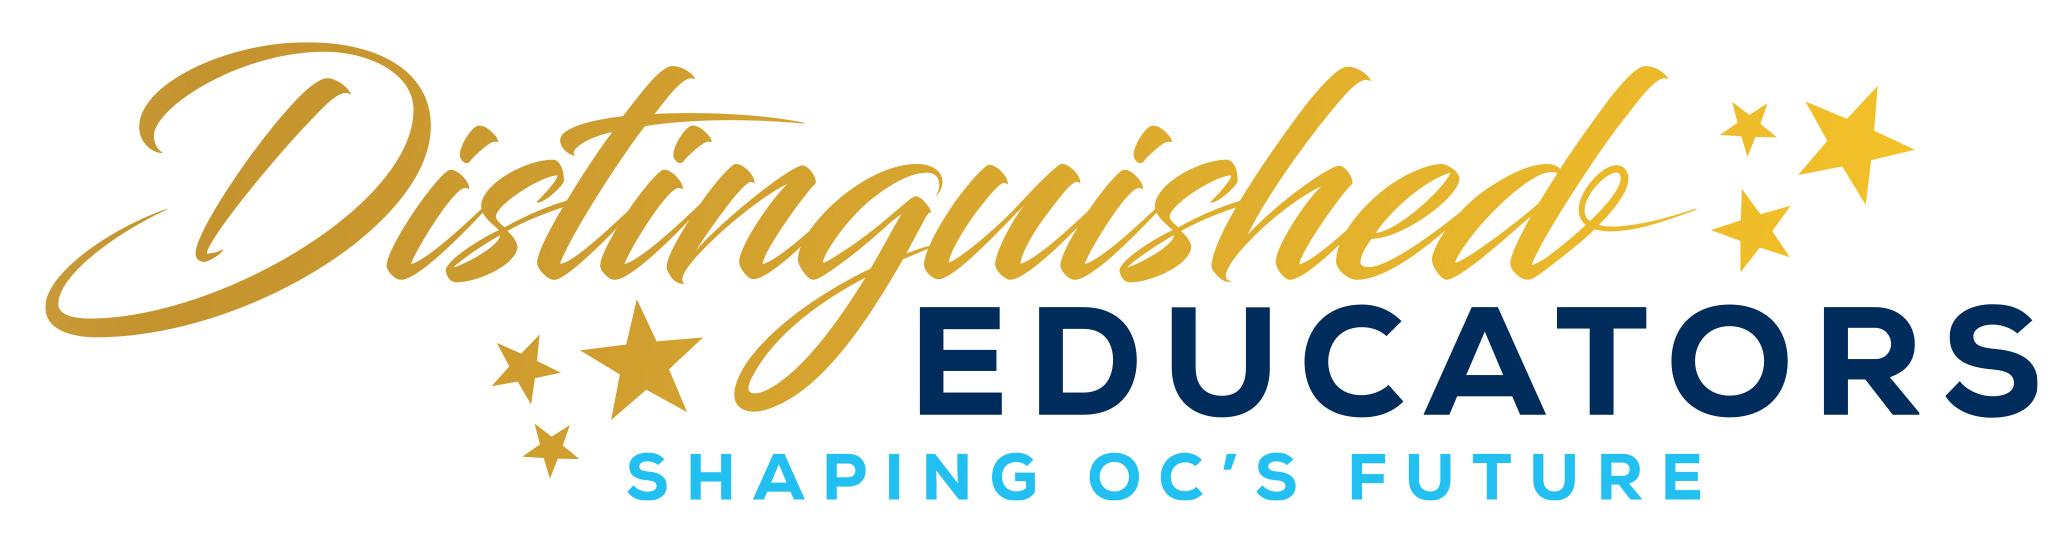 Distinguished Educators logo